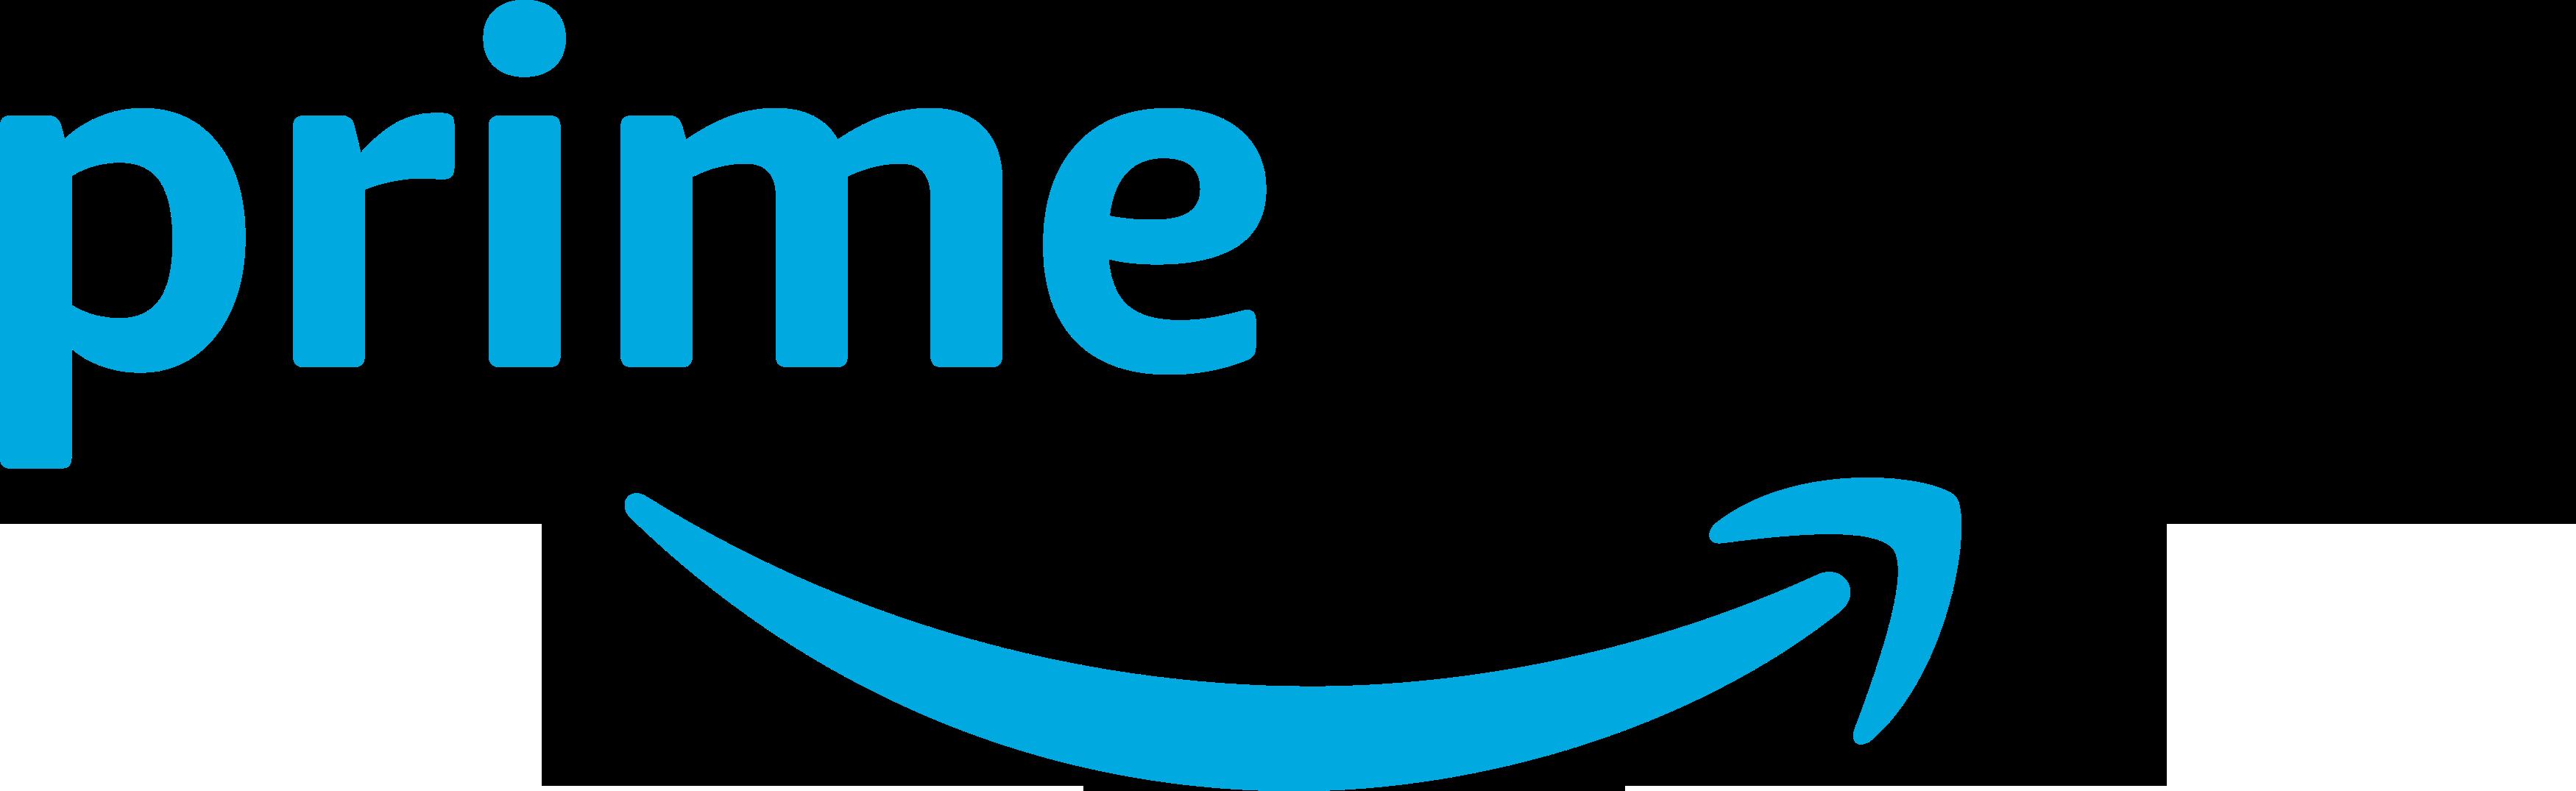 QT8 prime-video